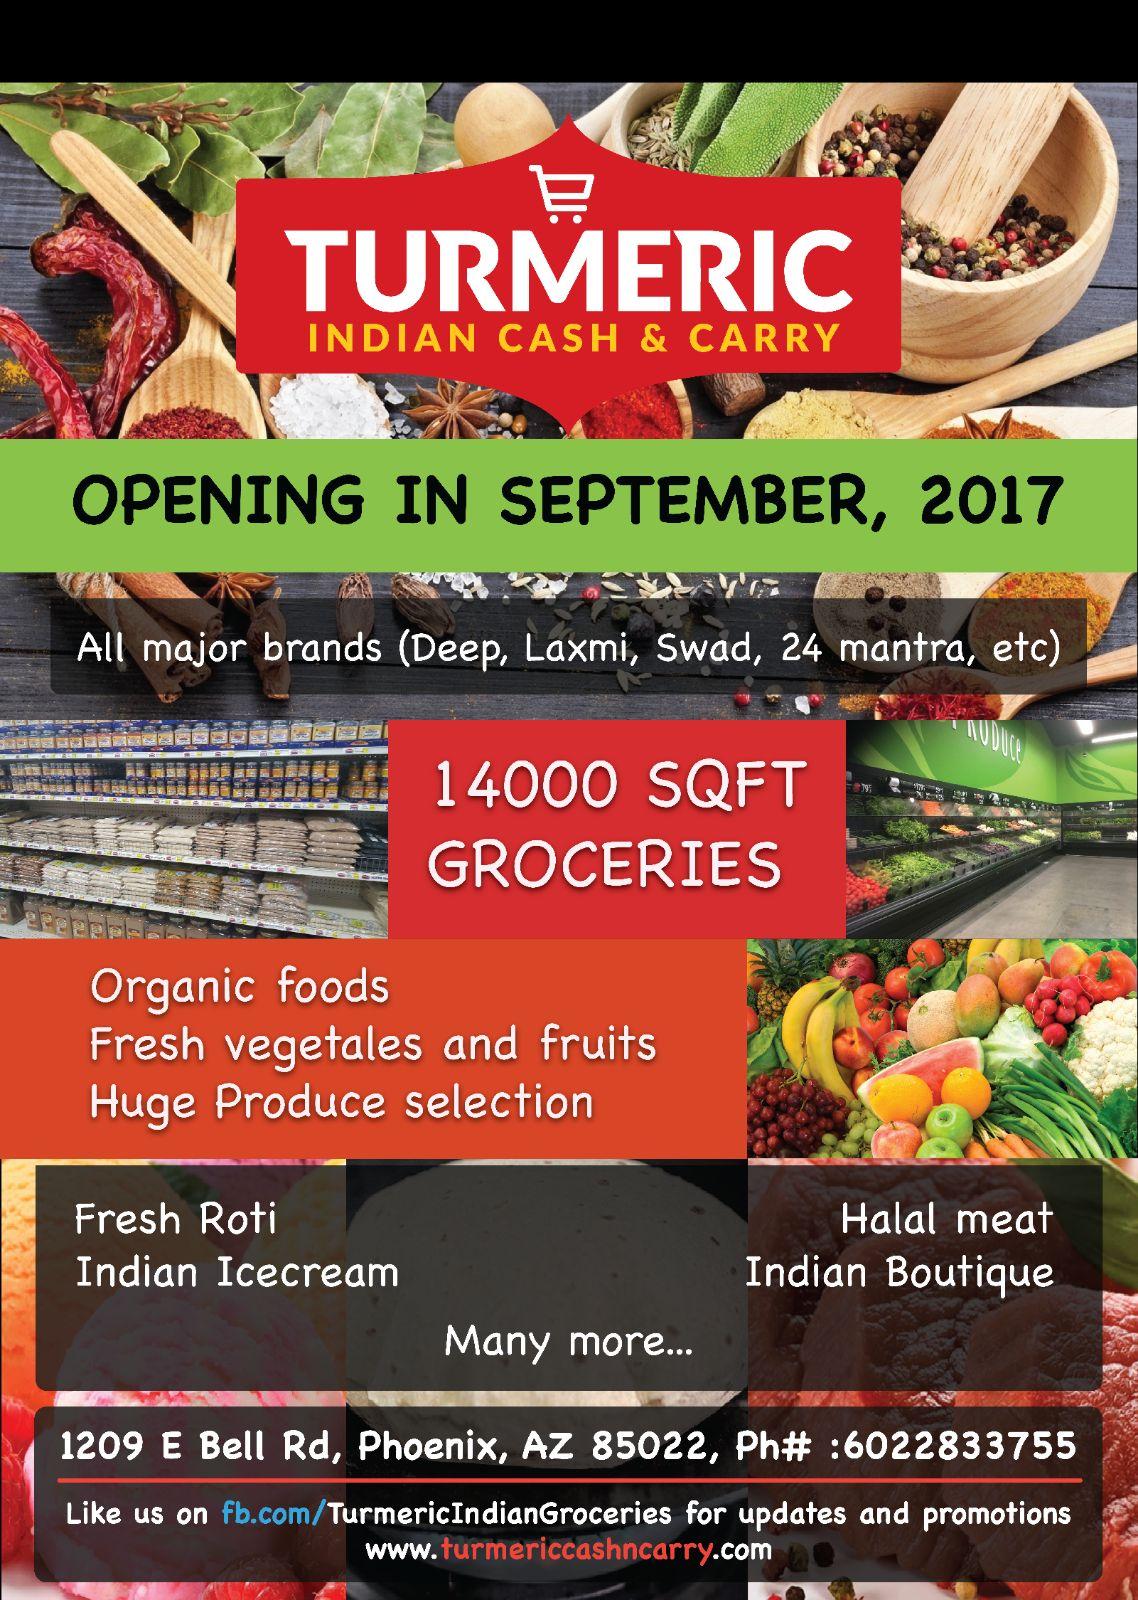 Turmeric Indian Groceries